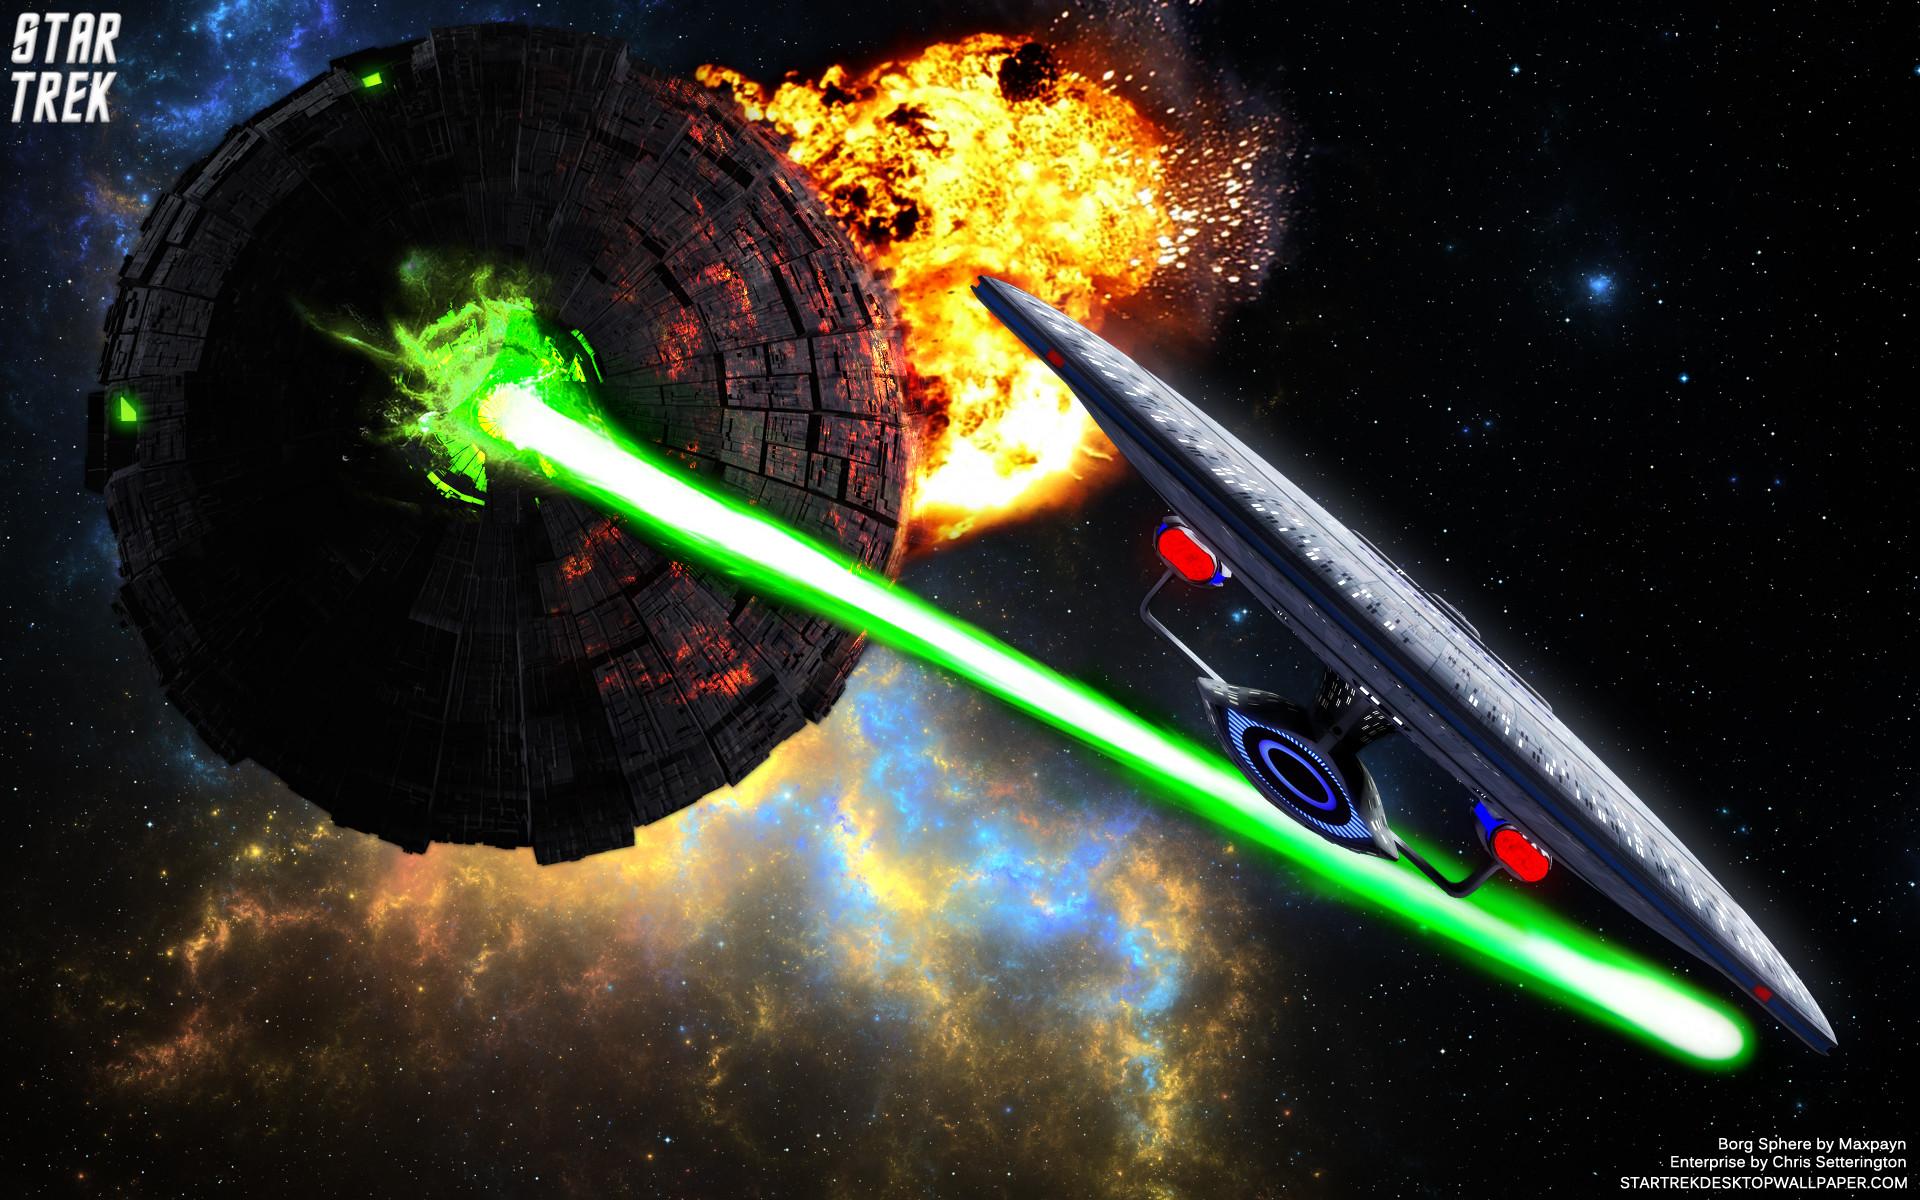 Source URL: https://www.fabuloussavers.com/new_wallpaper/Star_Trek_USS